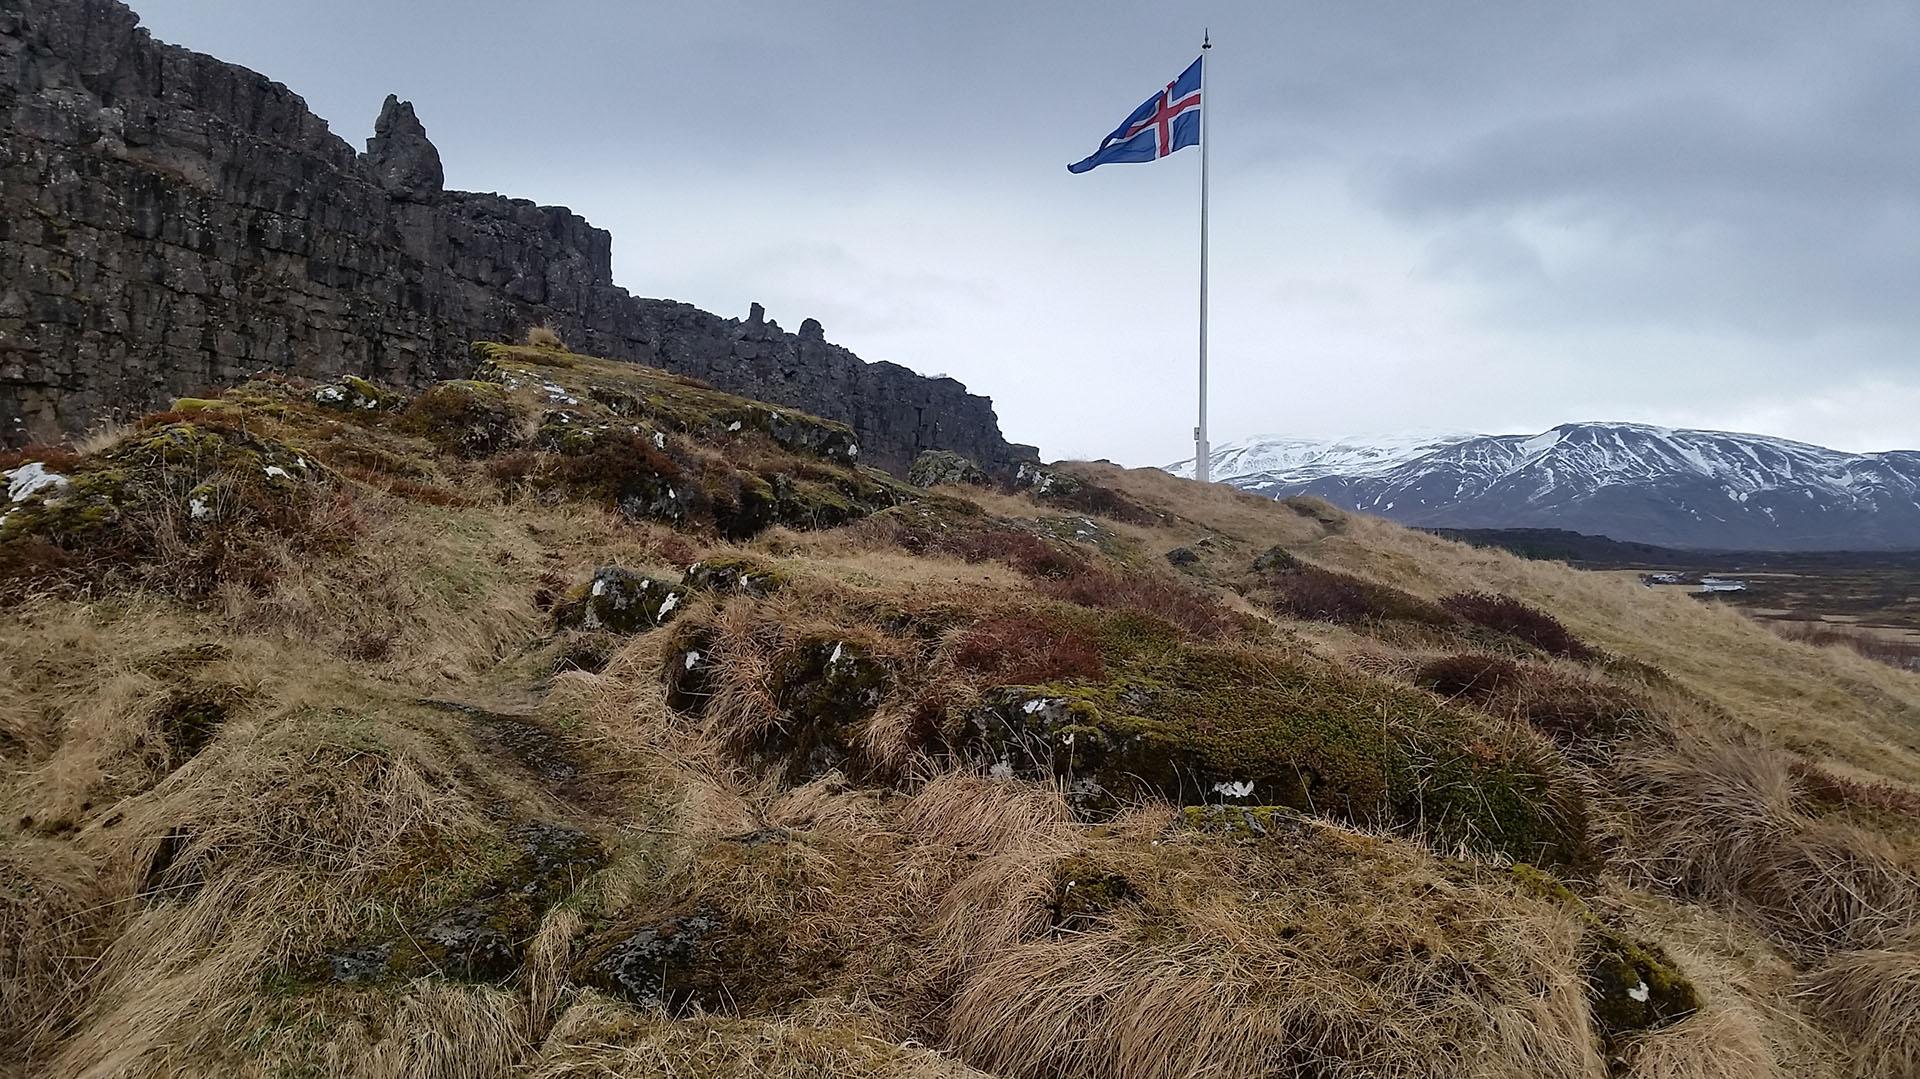 Thingvellir, área histórica donde se reunió el primer parlamento islandés en el año 930